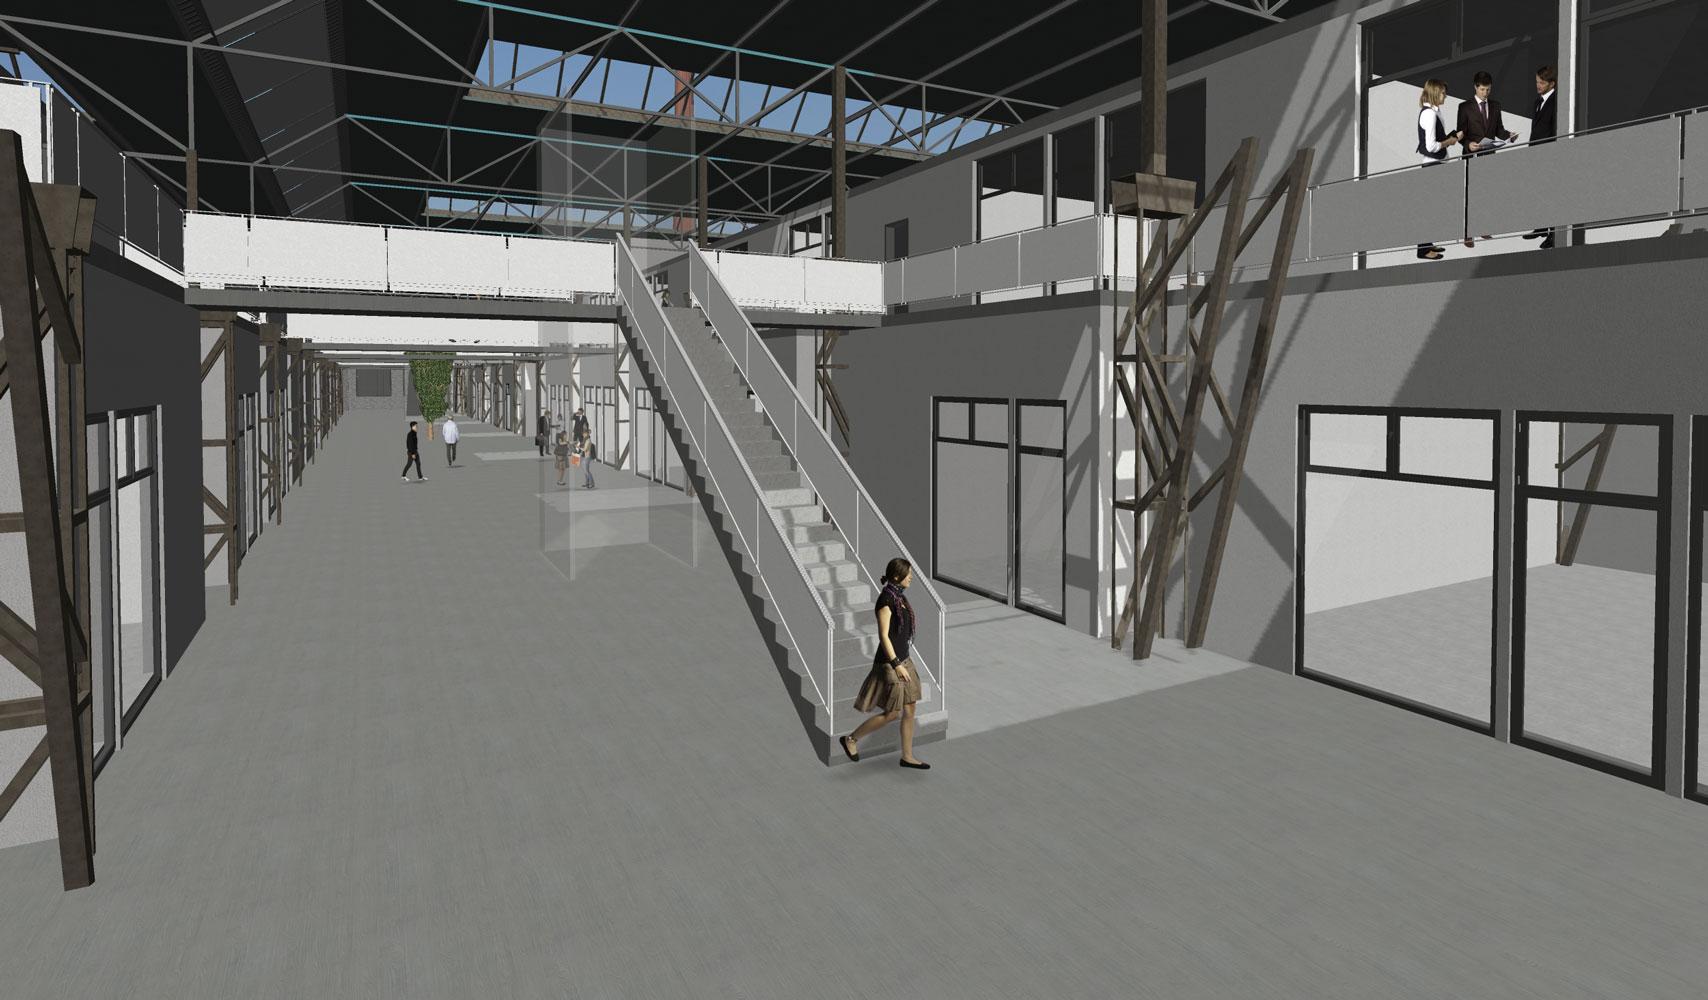 Korzynietz_Architekten_Wildau_visu02_web